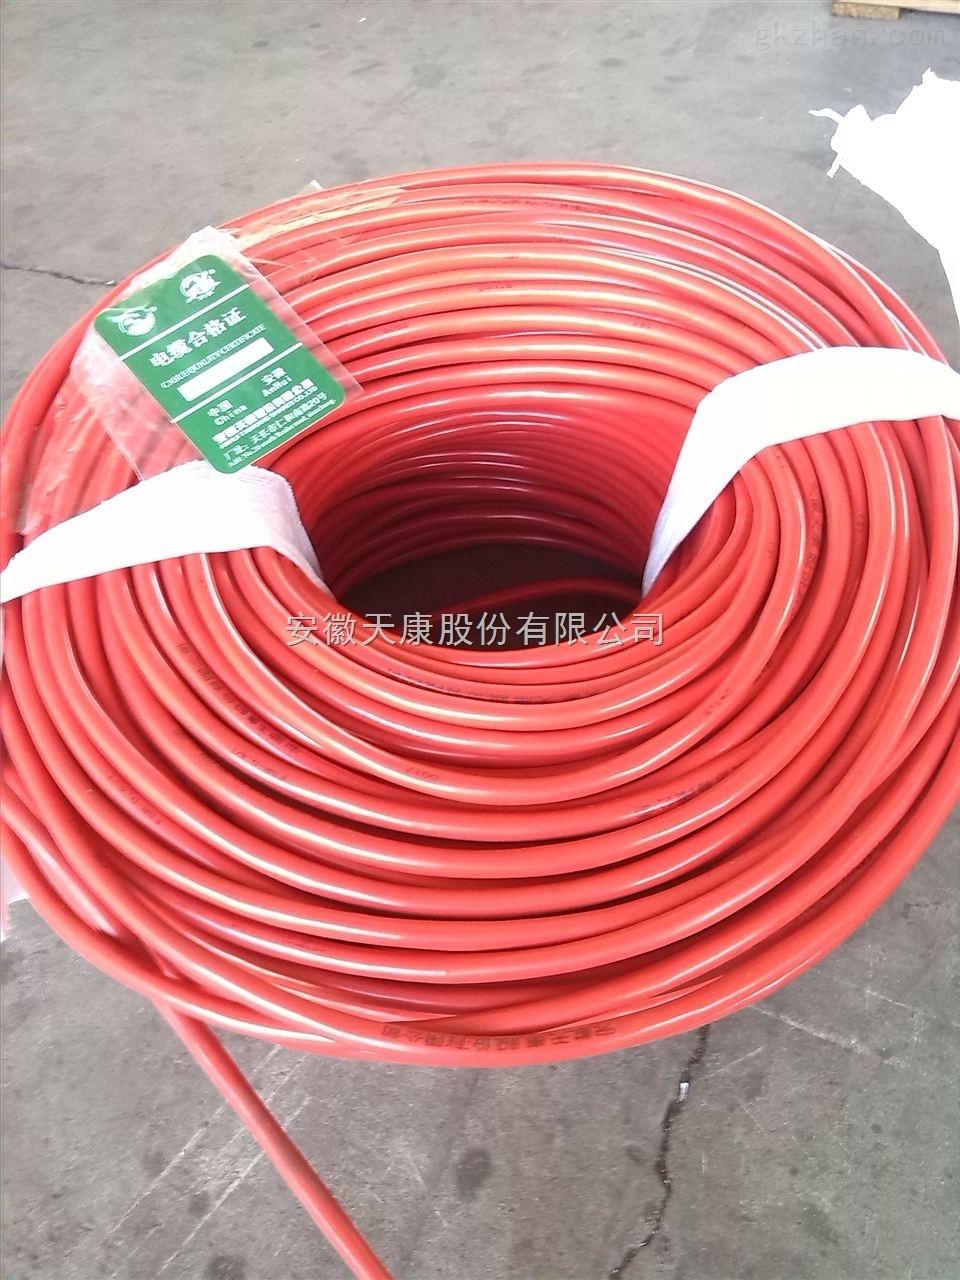 jgg电缆-硅橡胶电机引接线